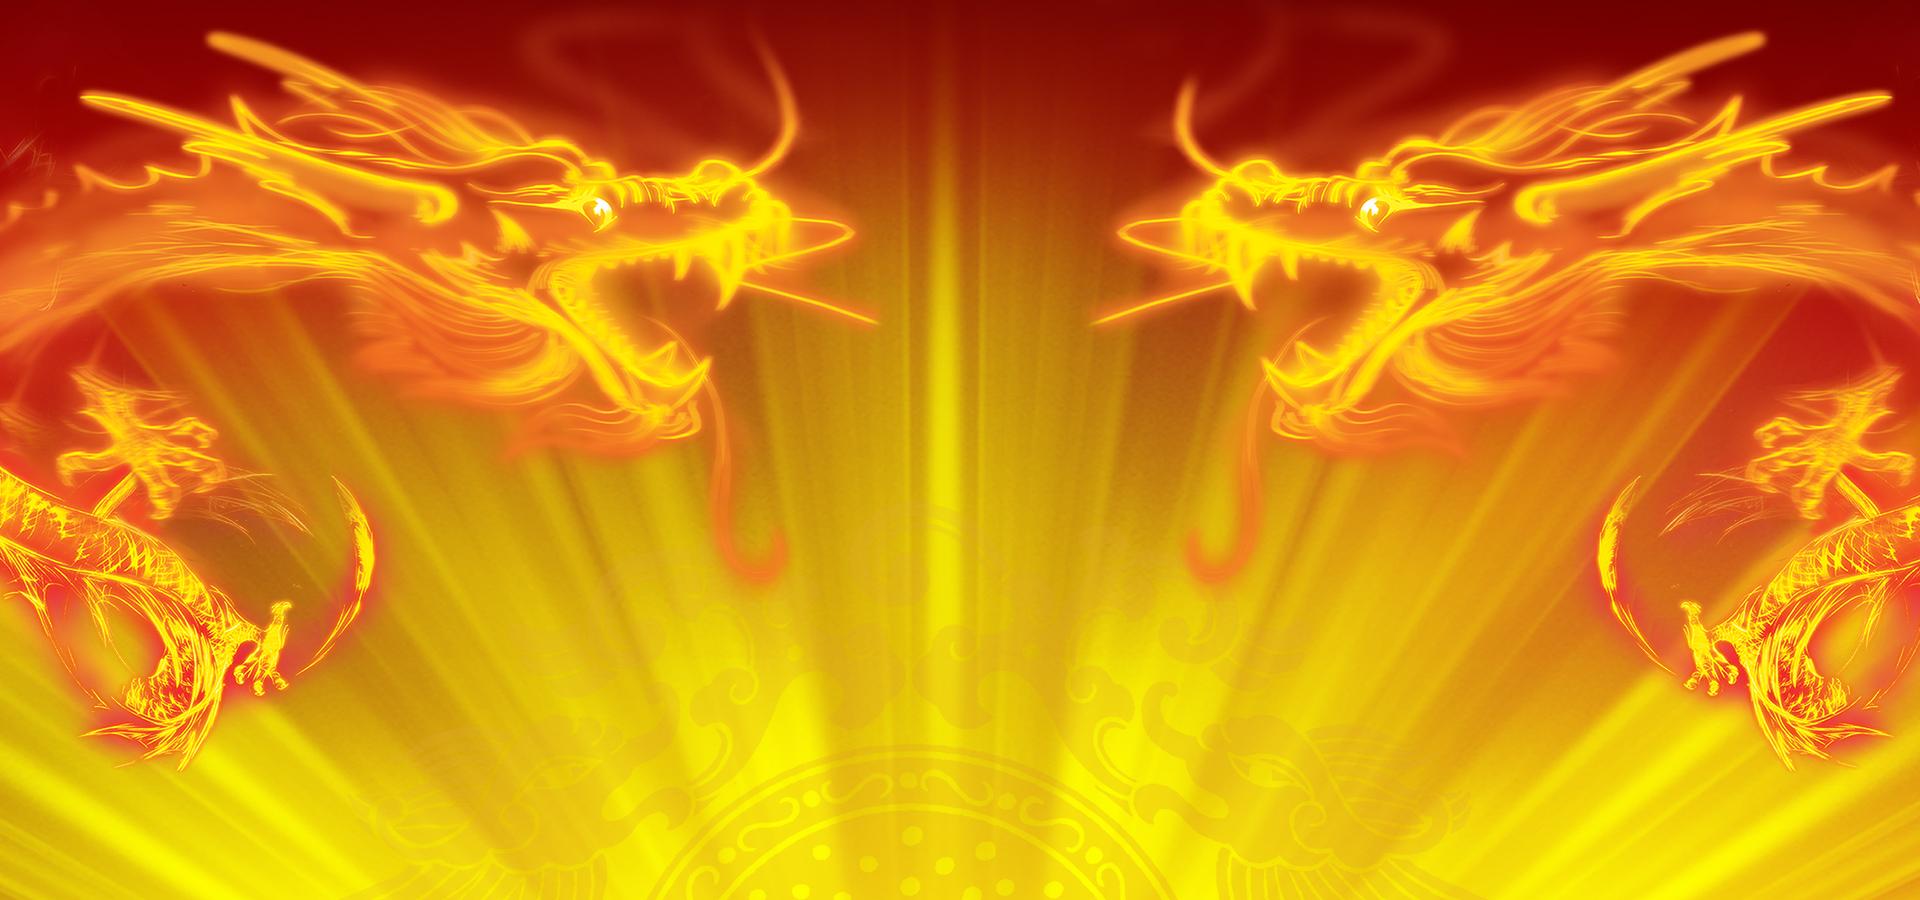 Blaze El Calor Arte Fractal Antecedentes Diseño Futurista Graficos